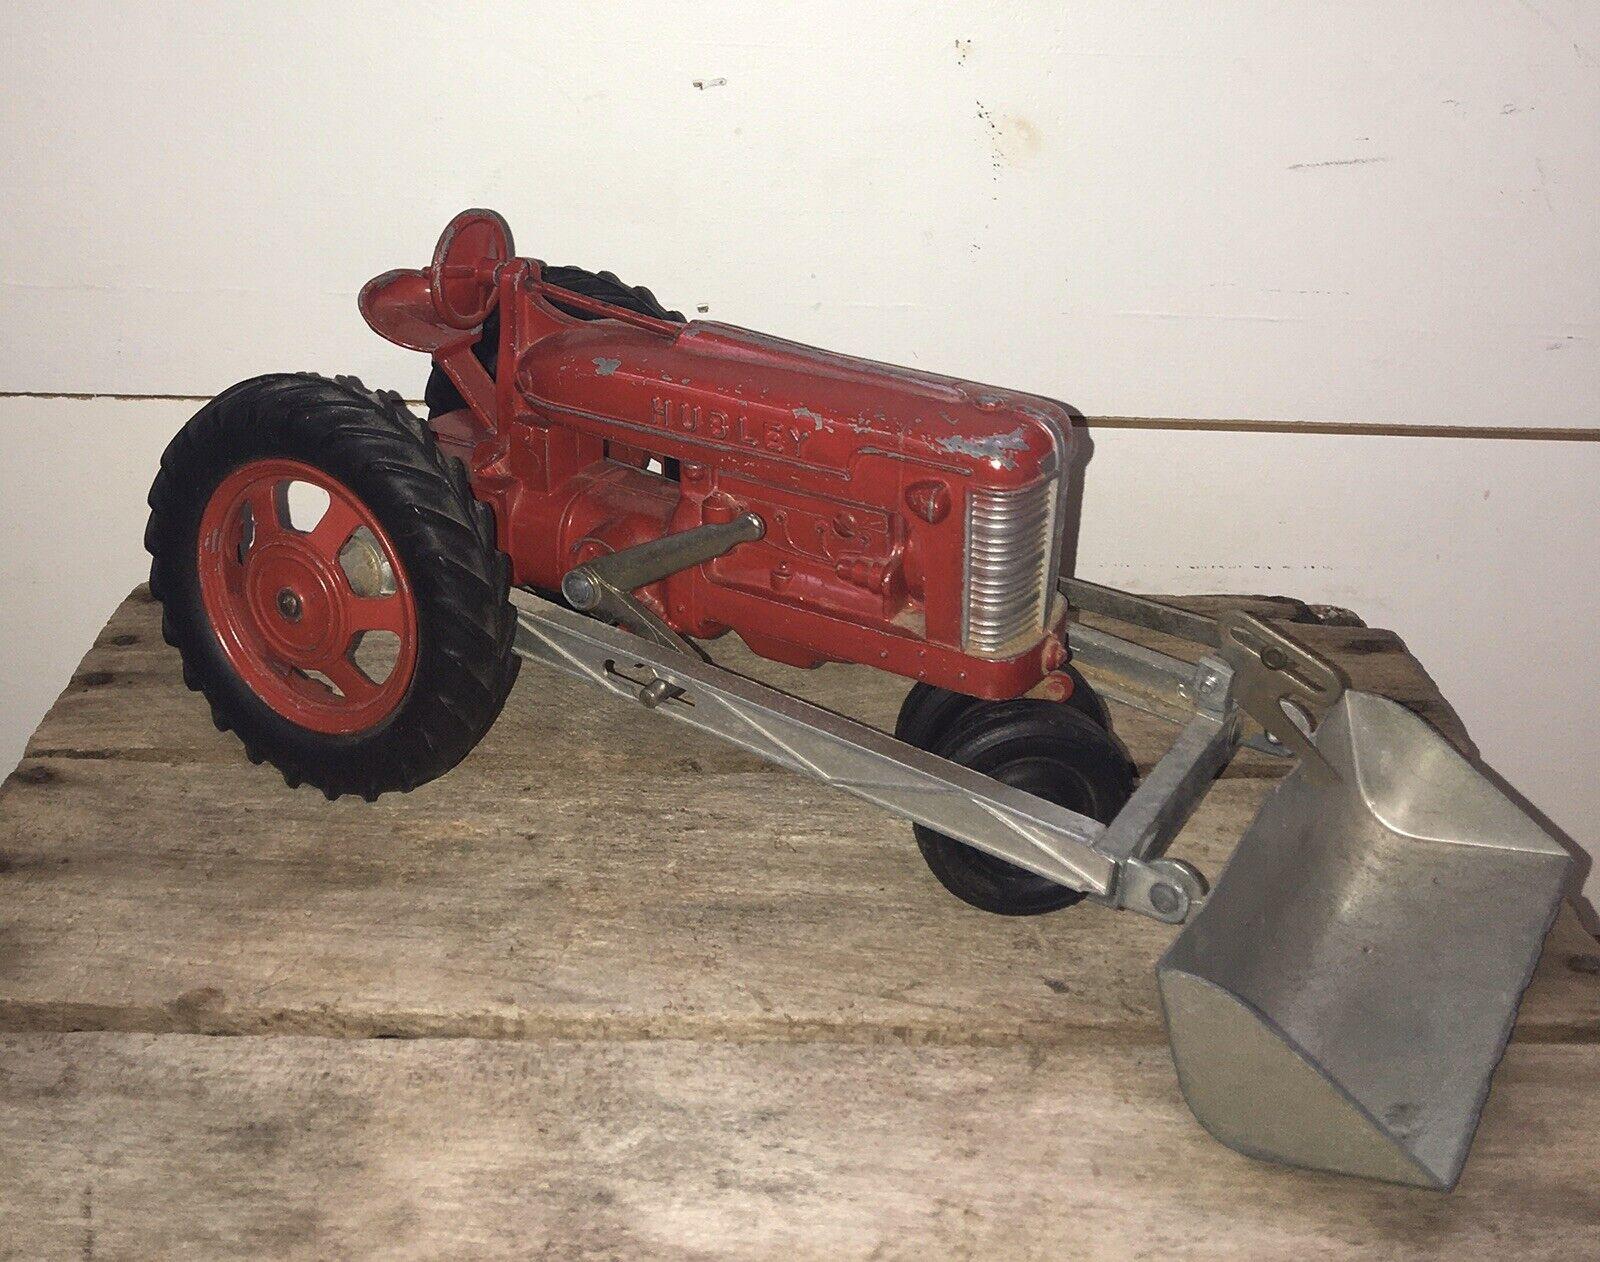 Vintage HUBLEY Kiddie Toy rot Farm Tractor W  Front End Scoop Loader Plow  500